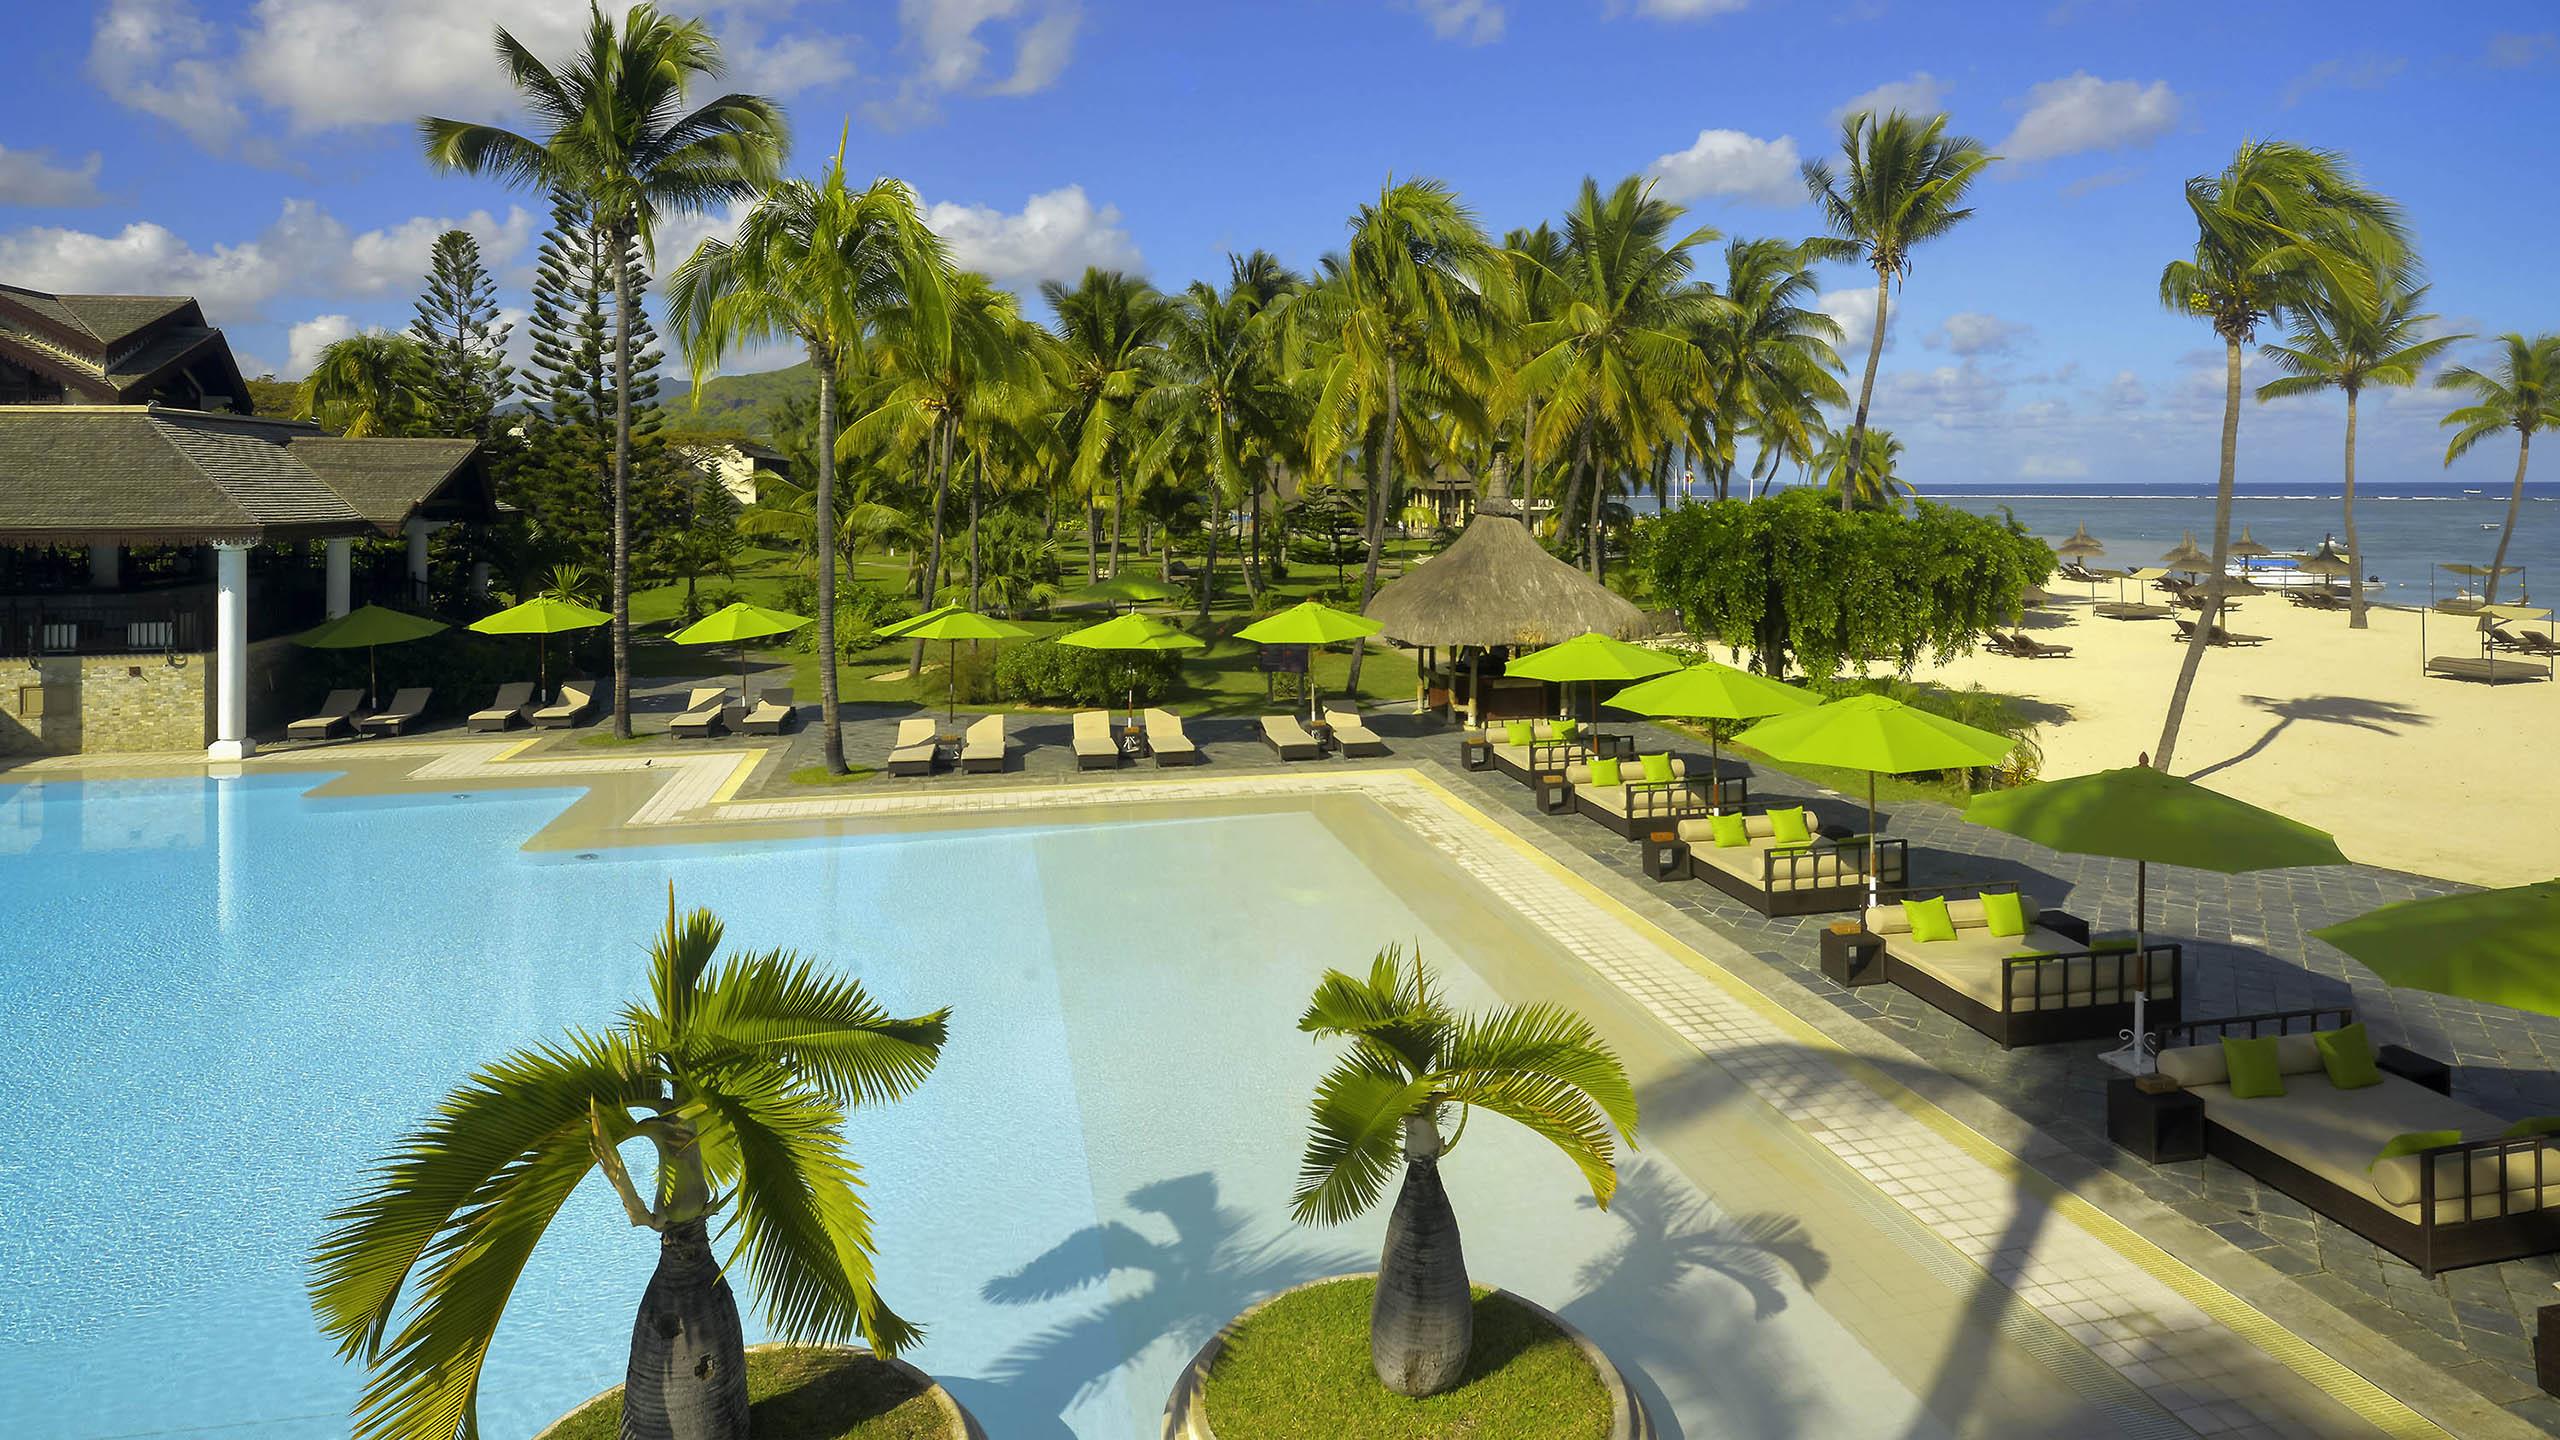 Luxury hotel FLIC EN FLAC - Sofitel Mauritius L'Impérial